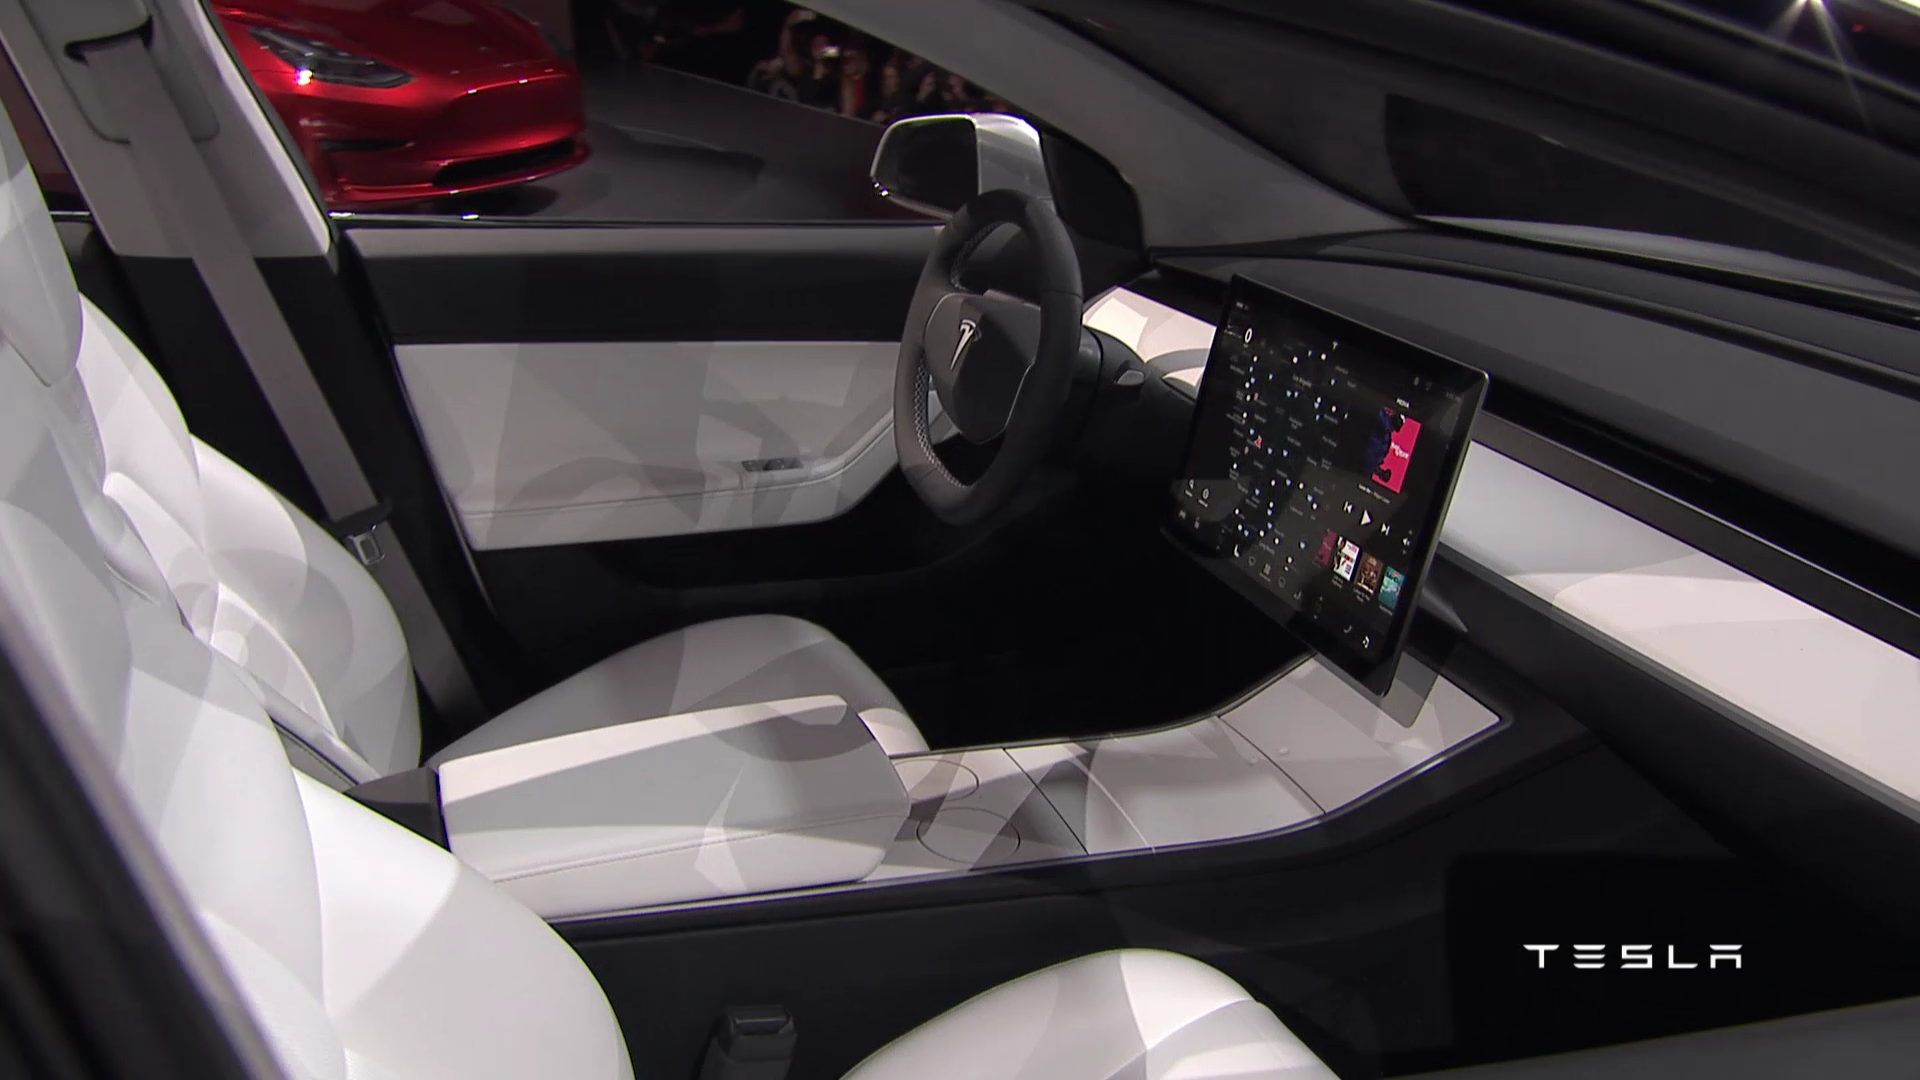 Tesla model 3 pictures interior